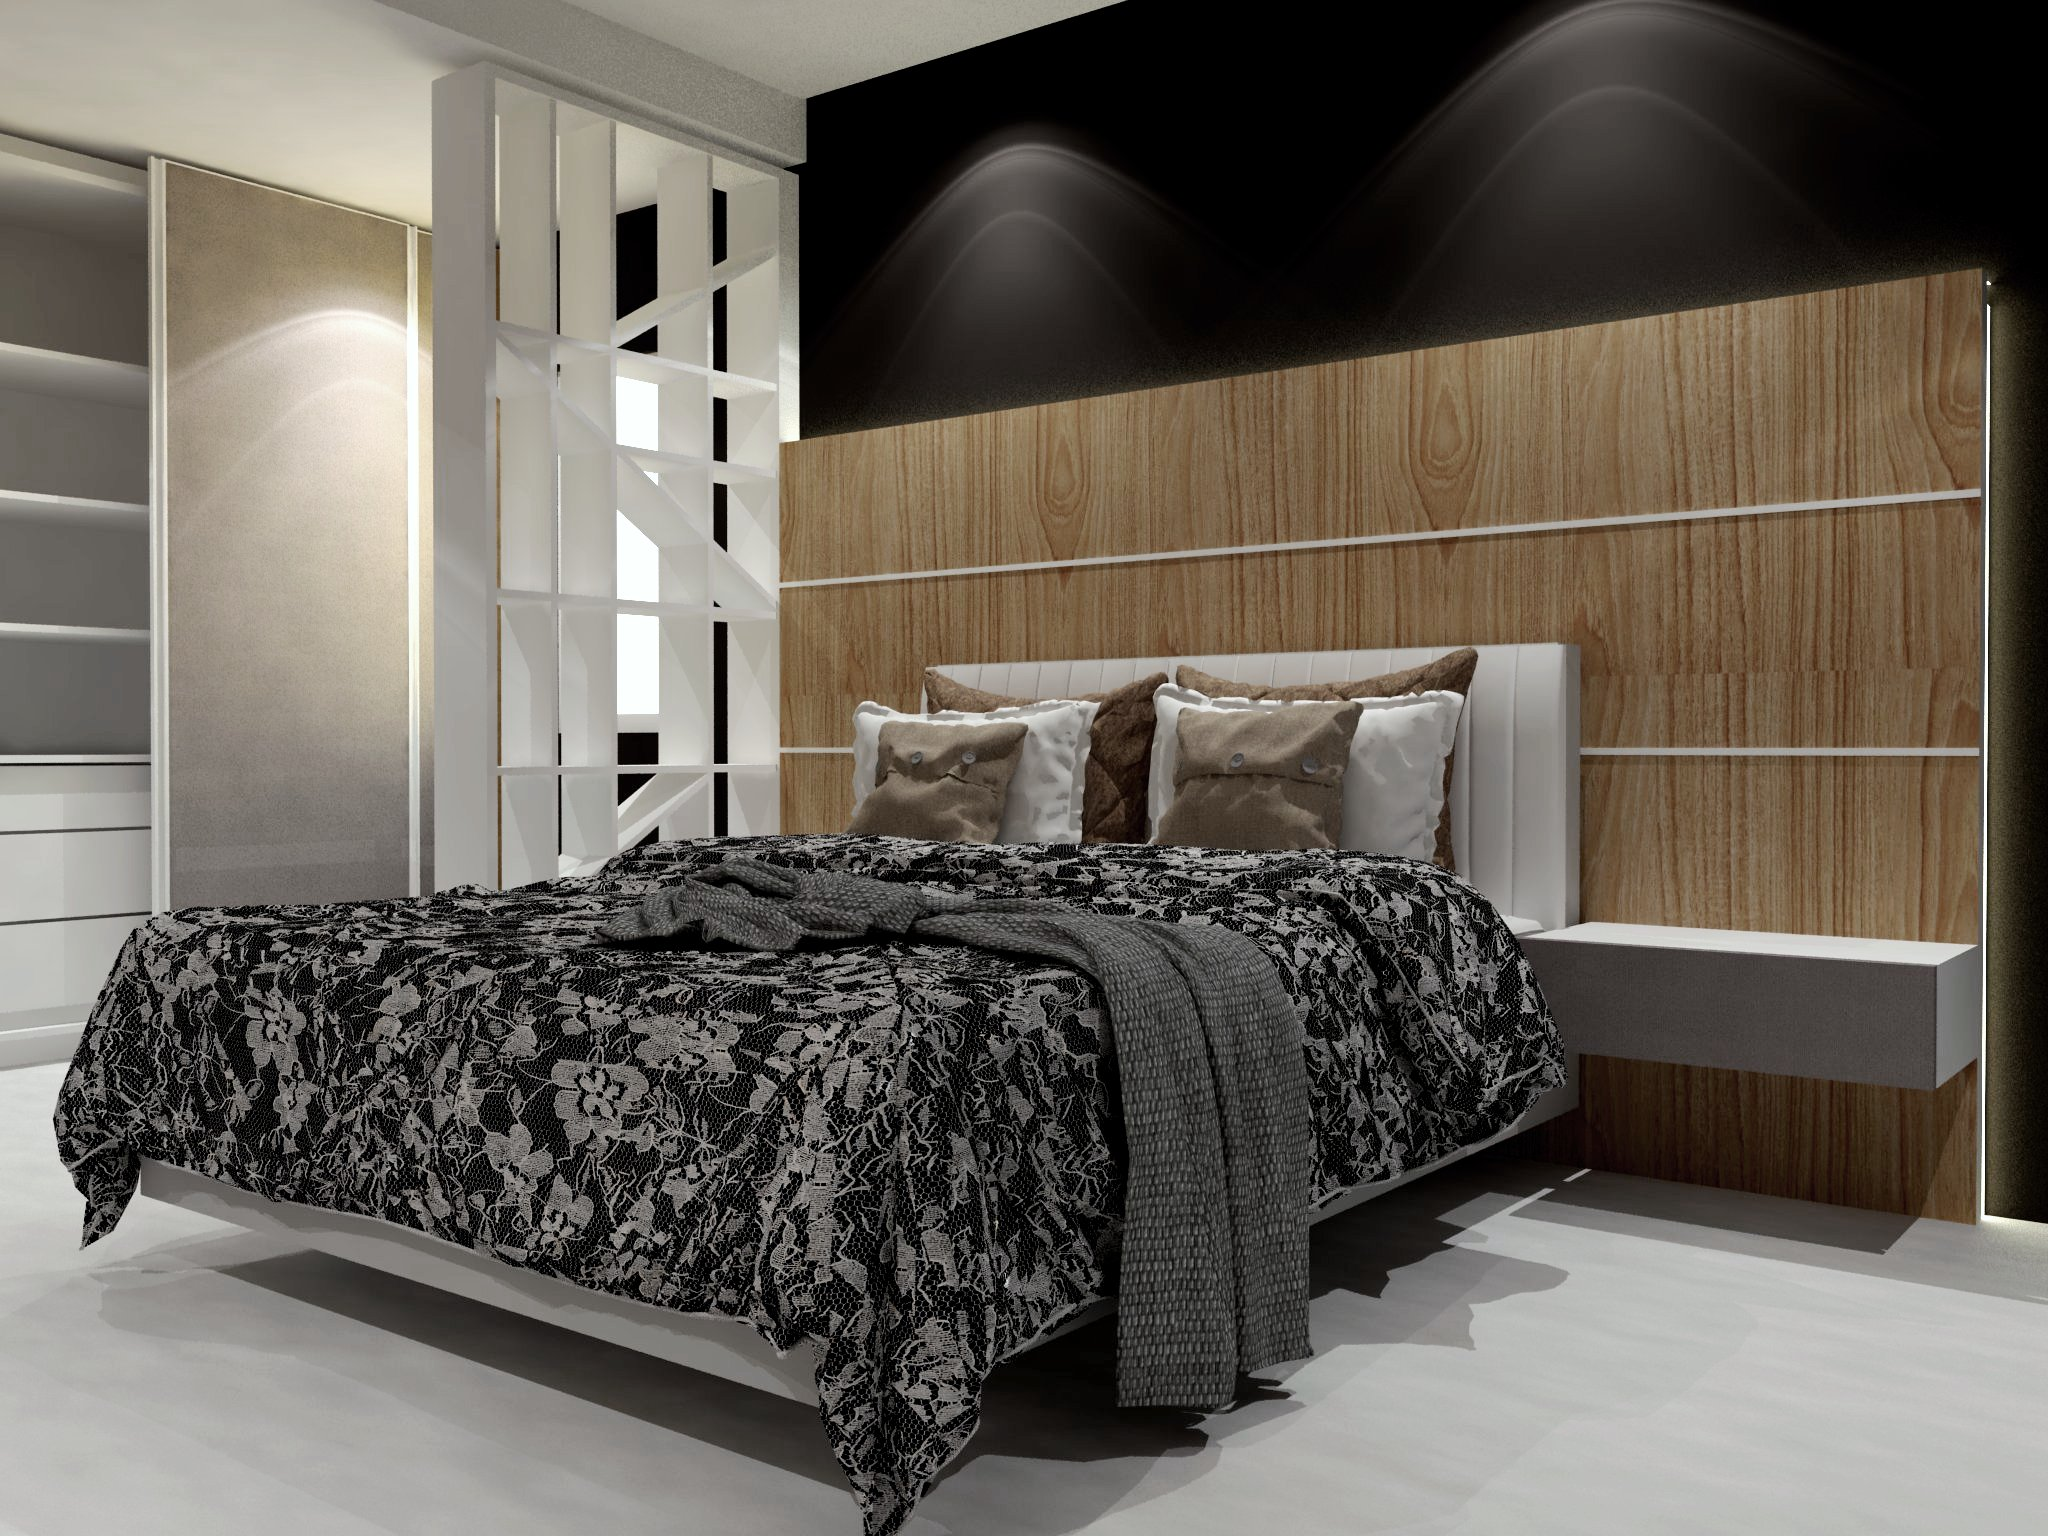 Desain room set apartemen di jakarta utara